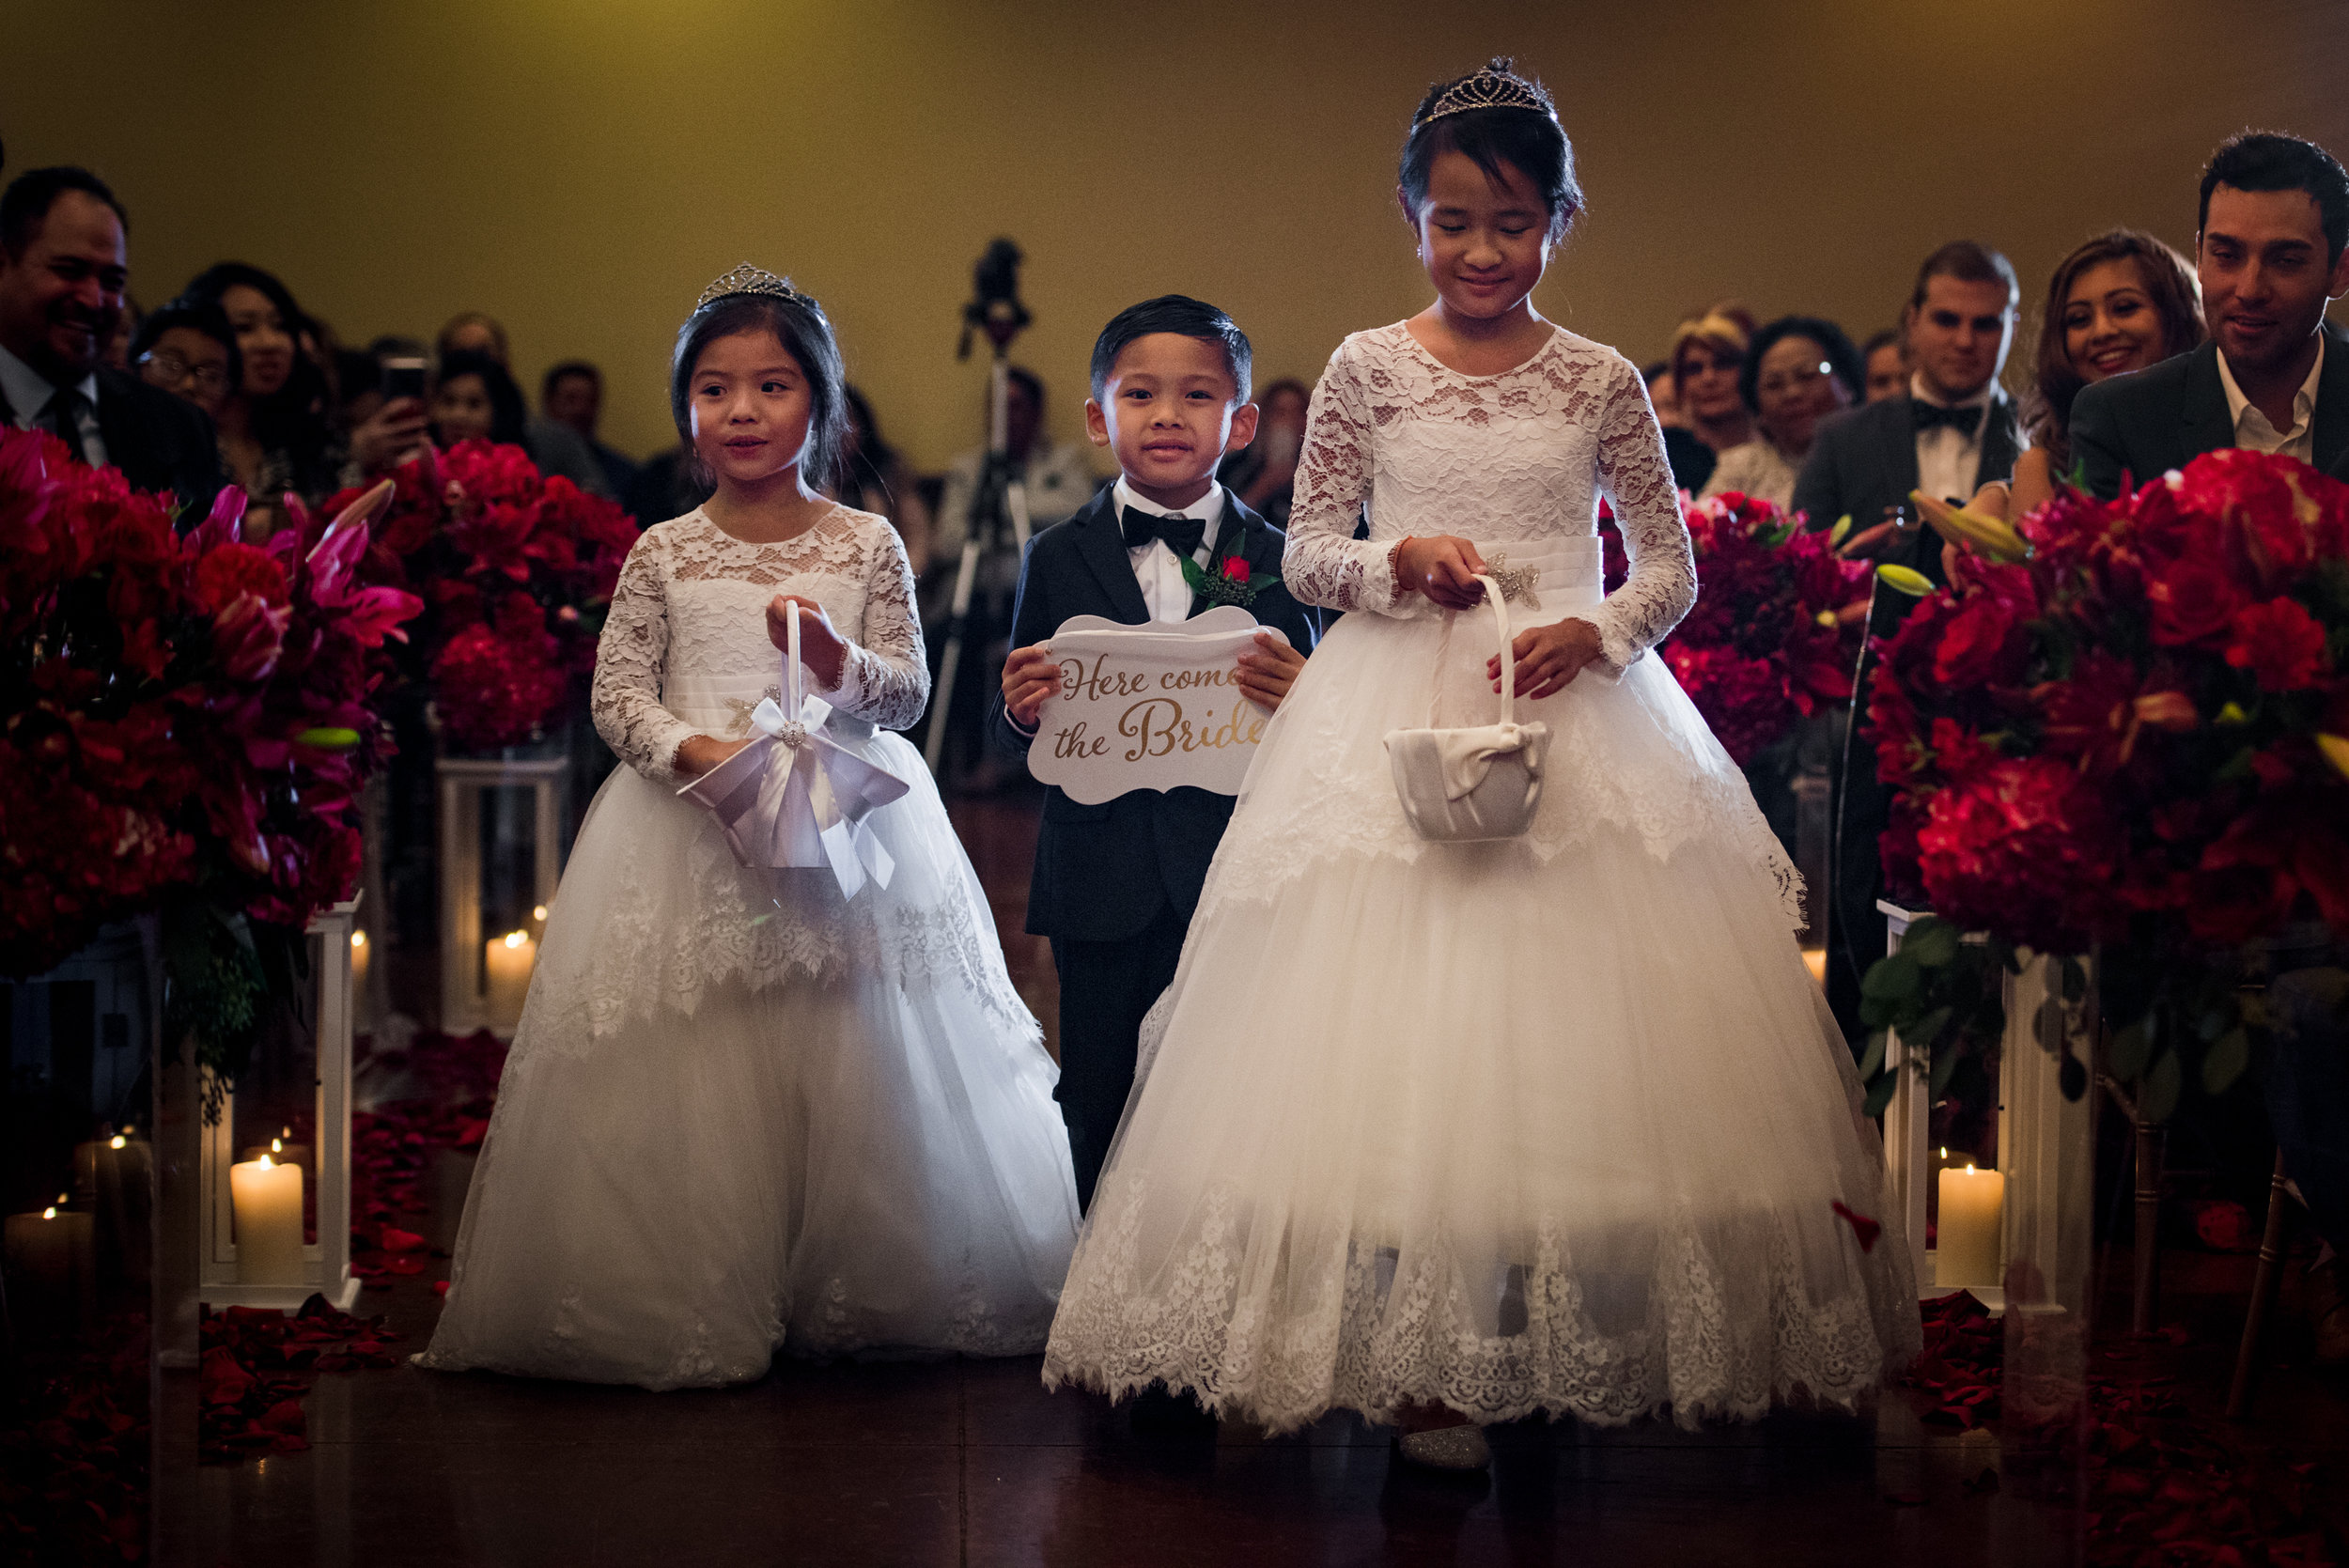 nikki-phillip-wedding-blog-23.jpg